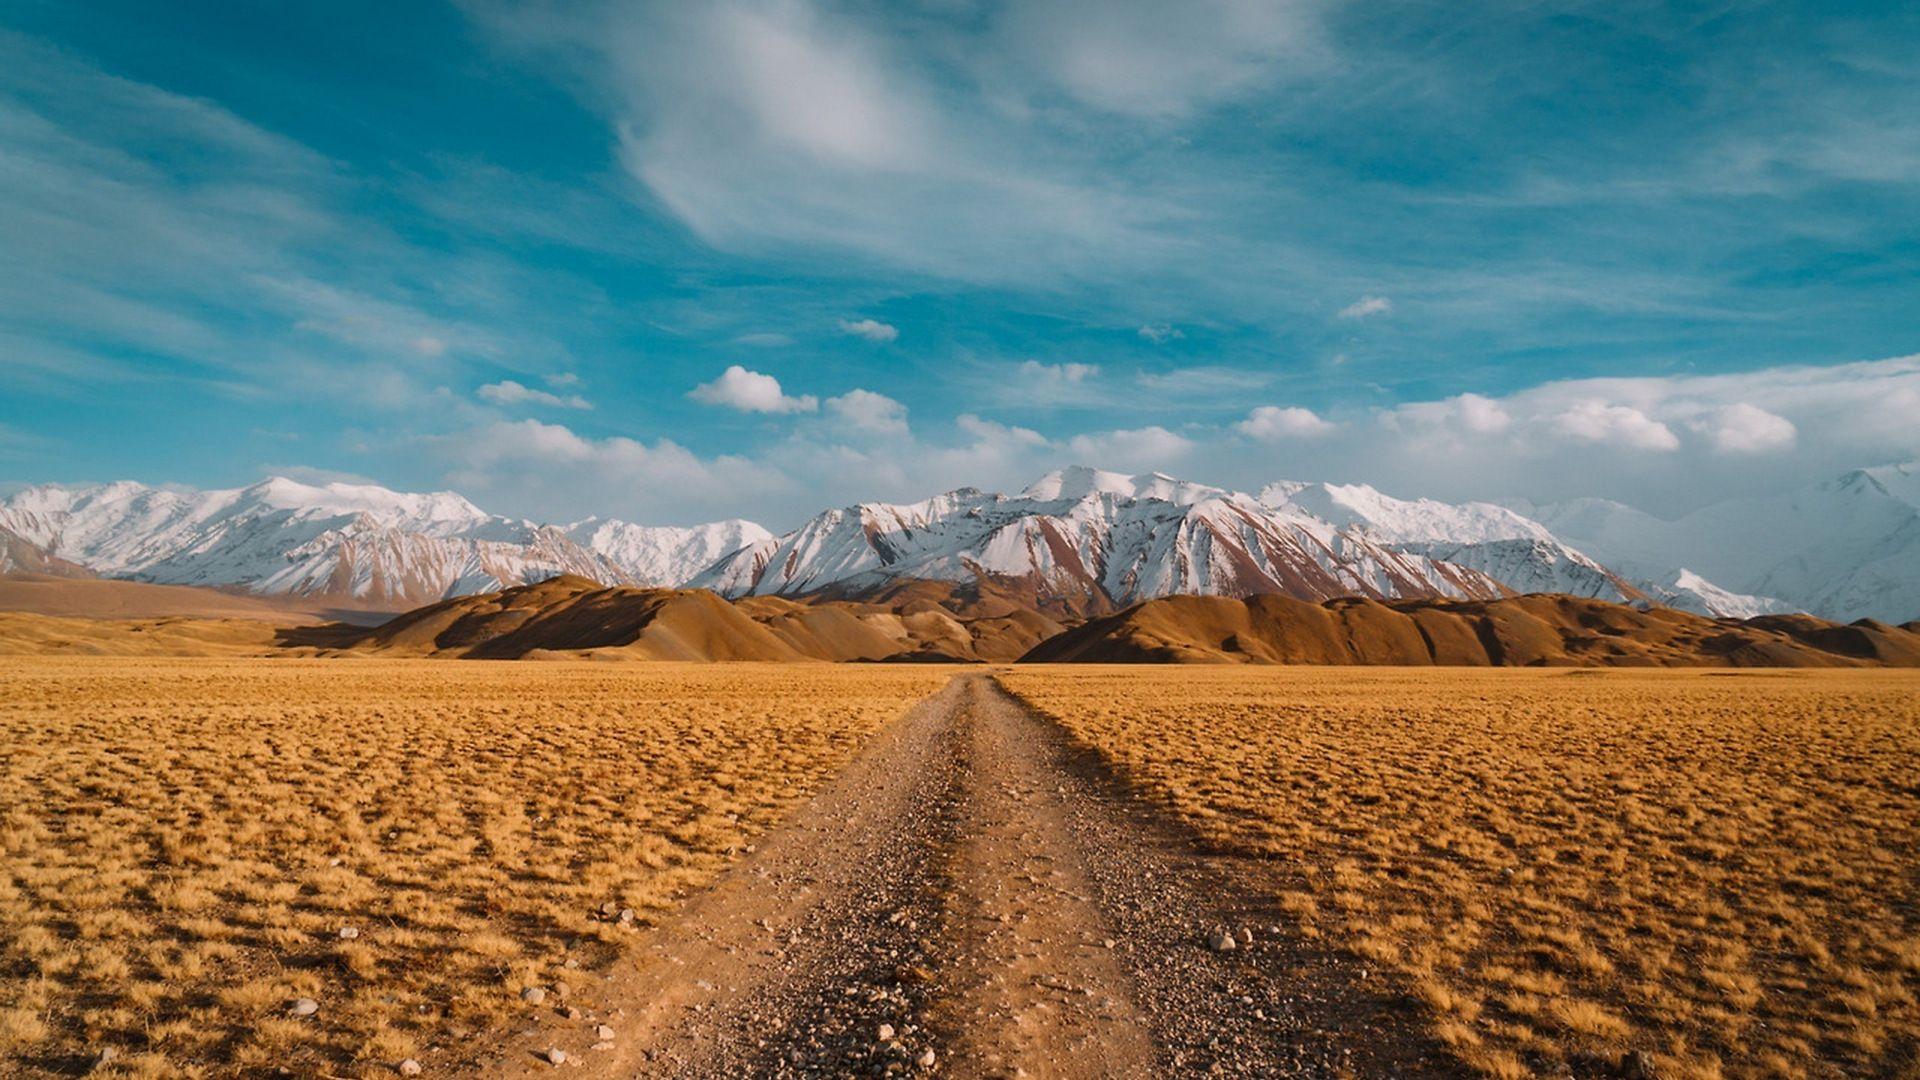 Desert Landscape Blue Skyline Mountains 1920x1080 Wallpaper Desert Landscape Design Landscape Desert Landscaping